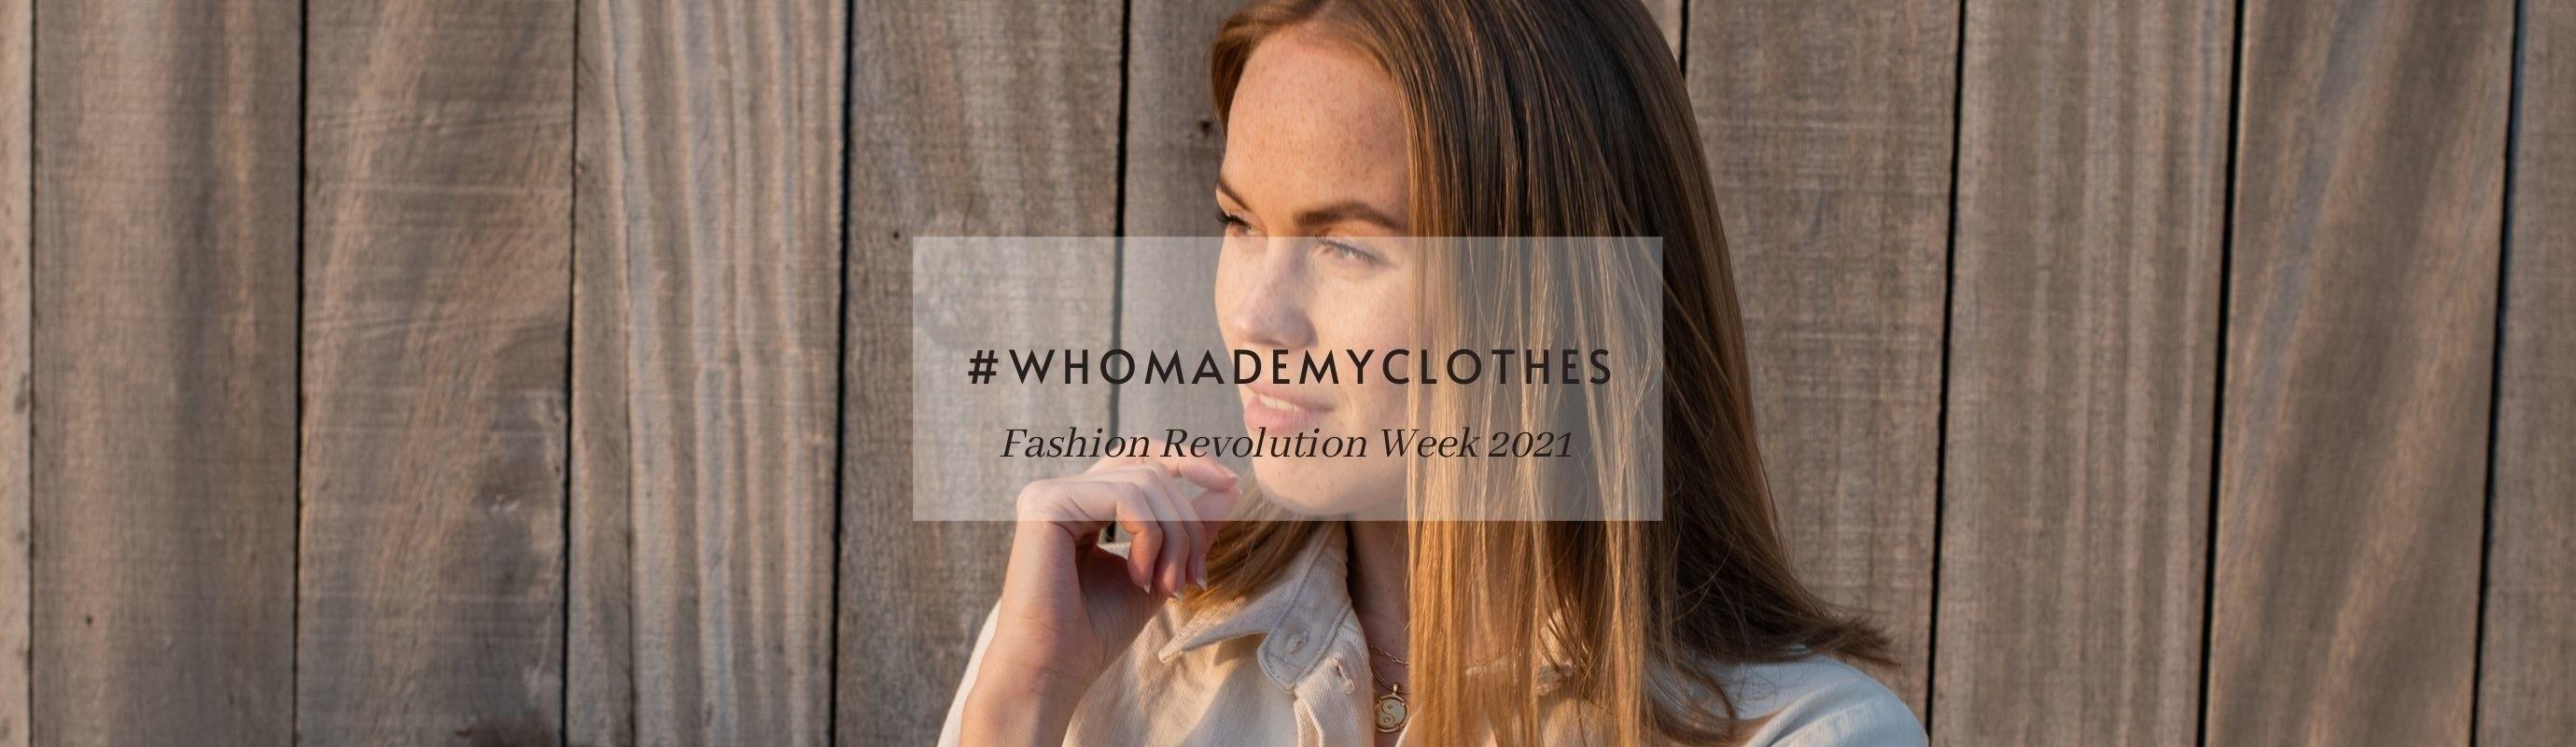 Fashion Revolution Week 2021